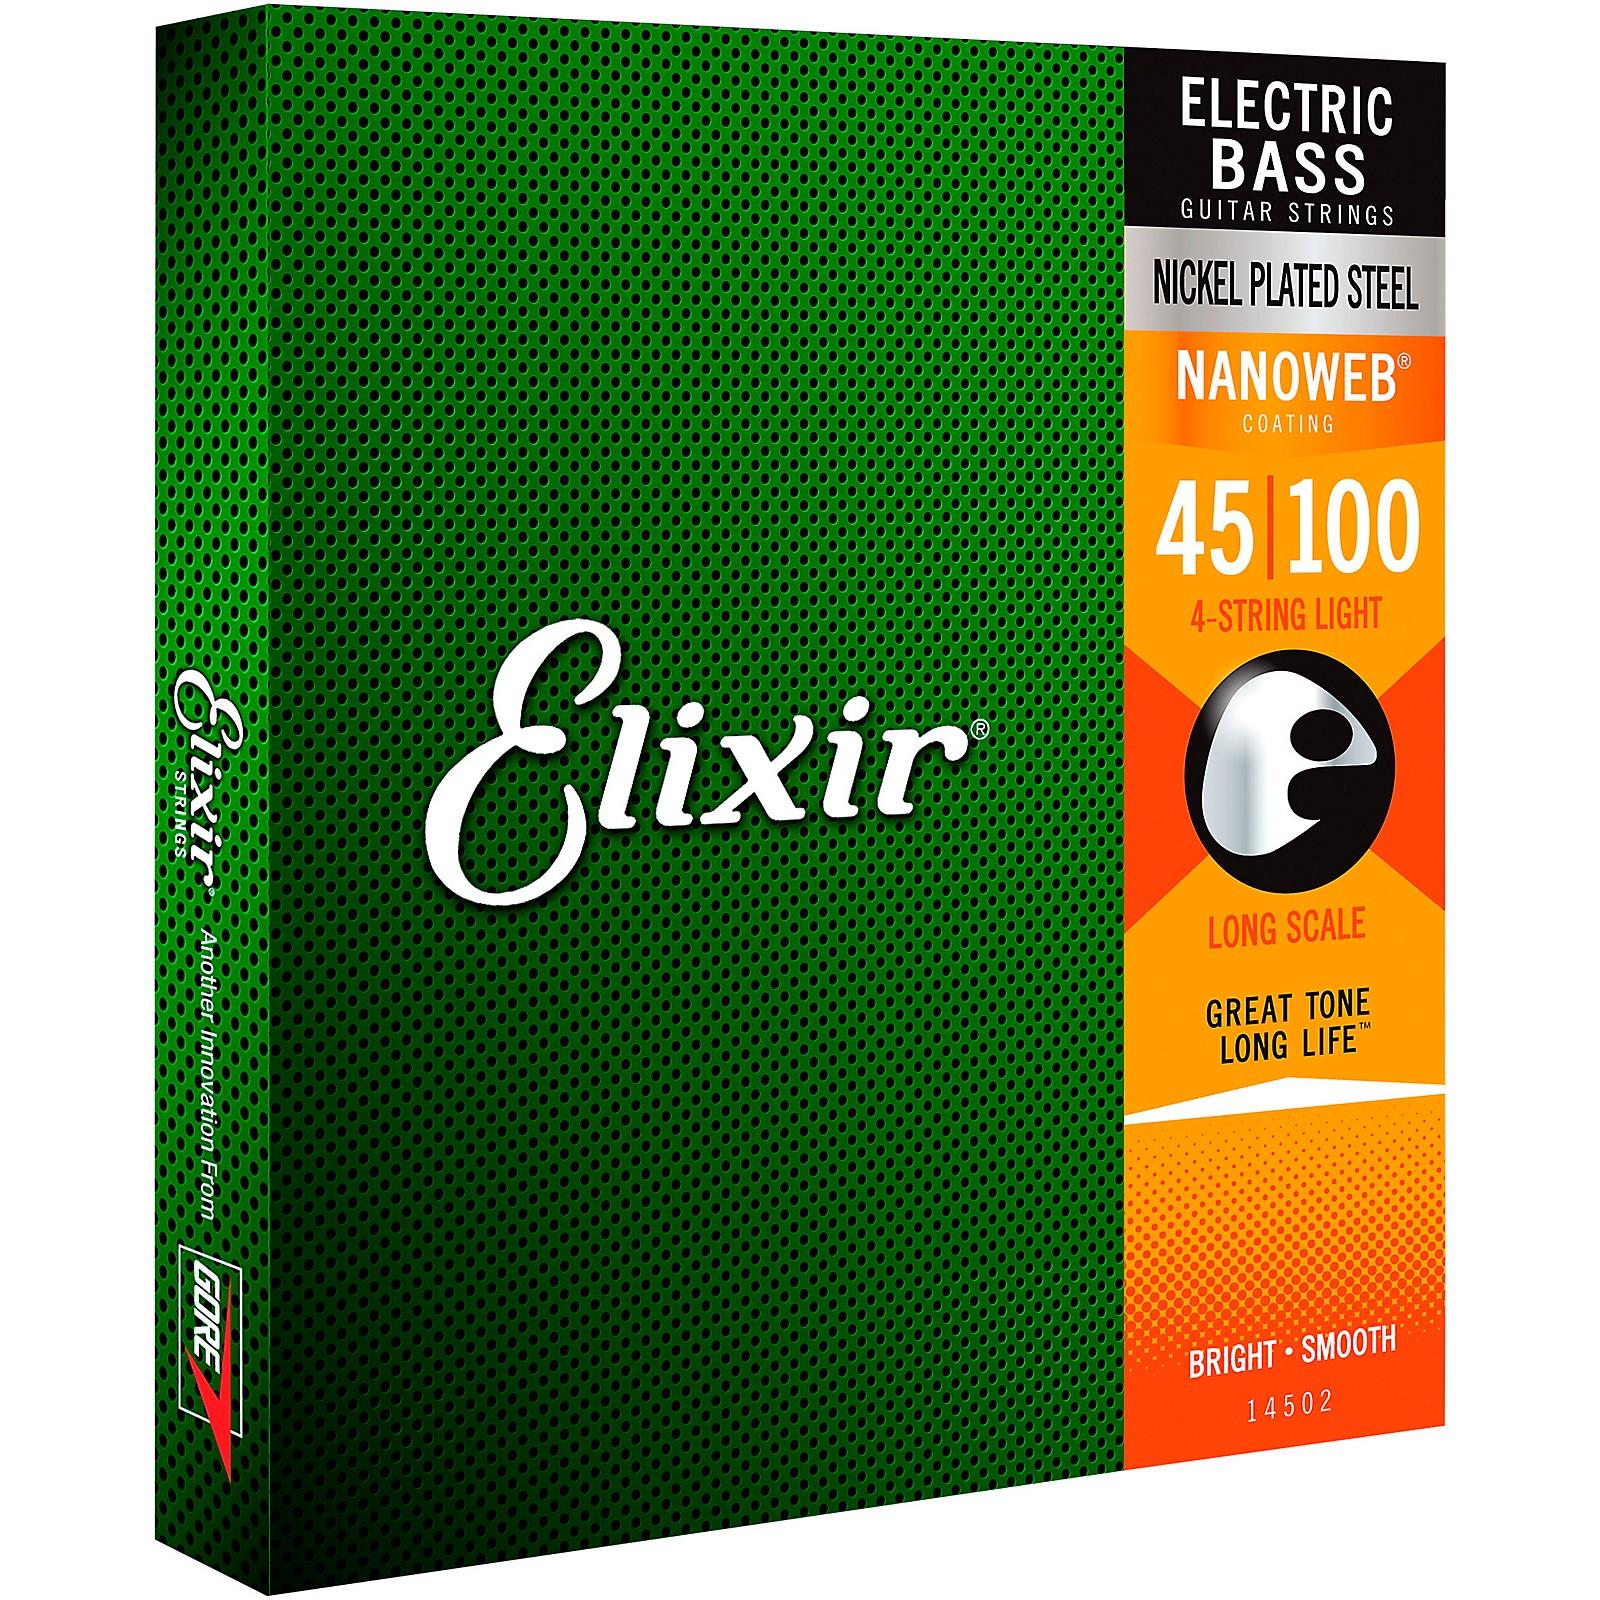 Elixir Nickel-Plated Steel 4-String Bass Strings with NANOWEB Coating, Long Scale, Light (.045-.100)